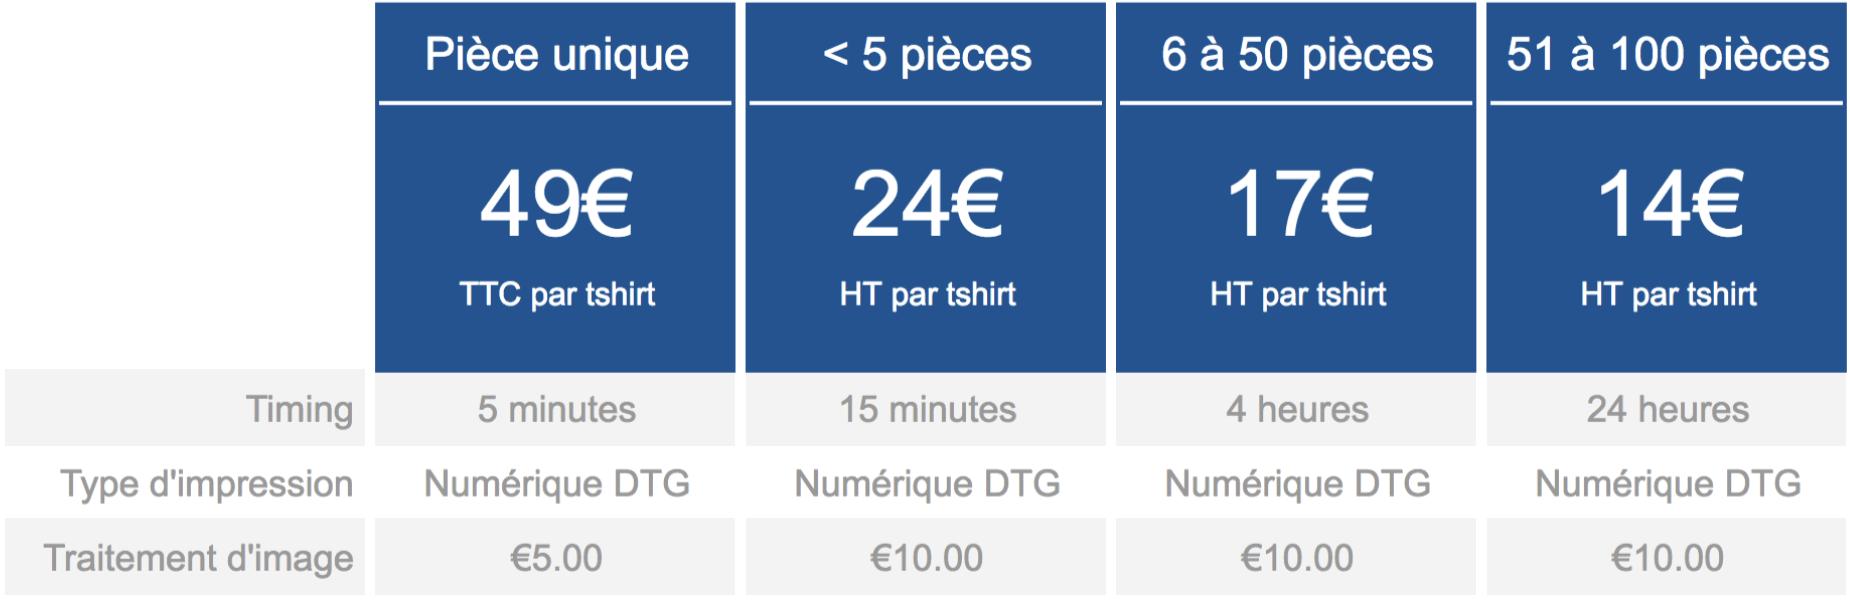 Pack-Textile-clair-sweat-promotionnel-coton-personnalisation-pro-triaaangles.png